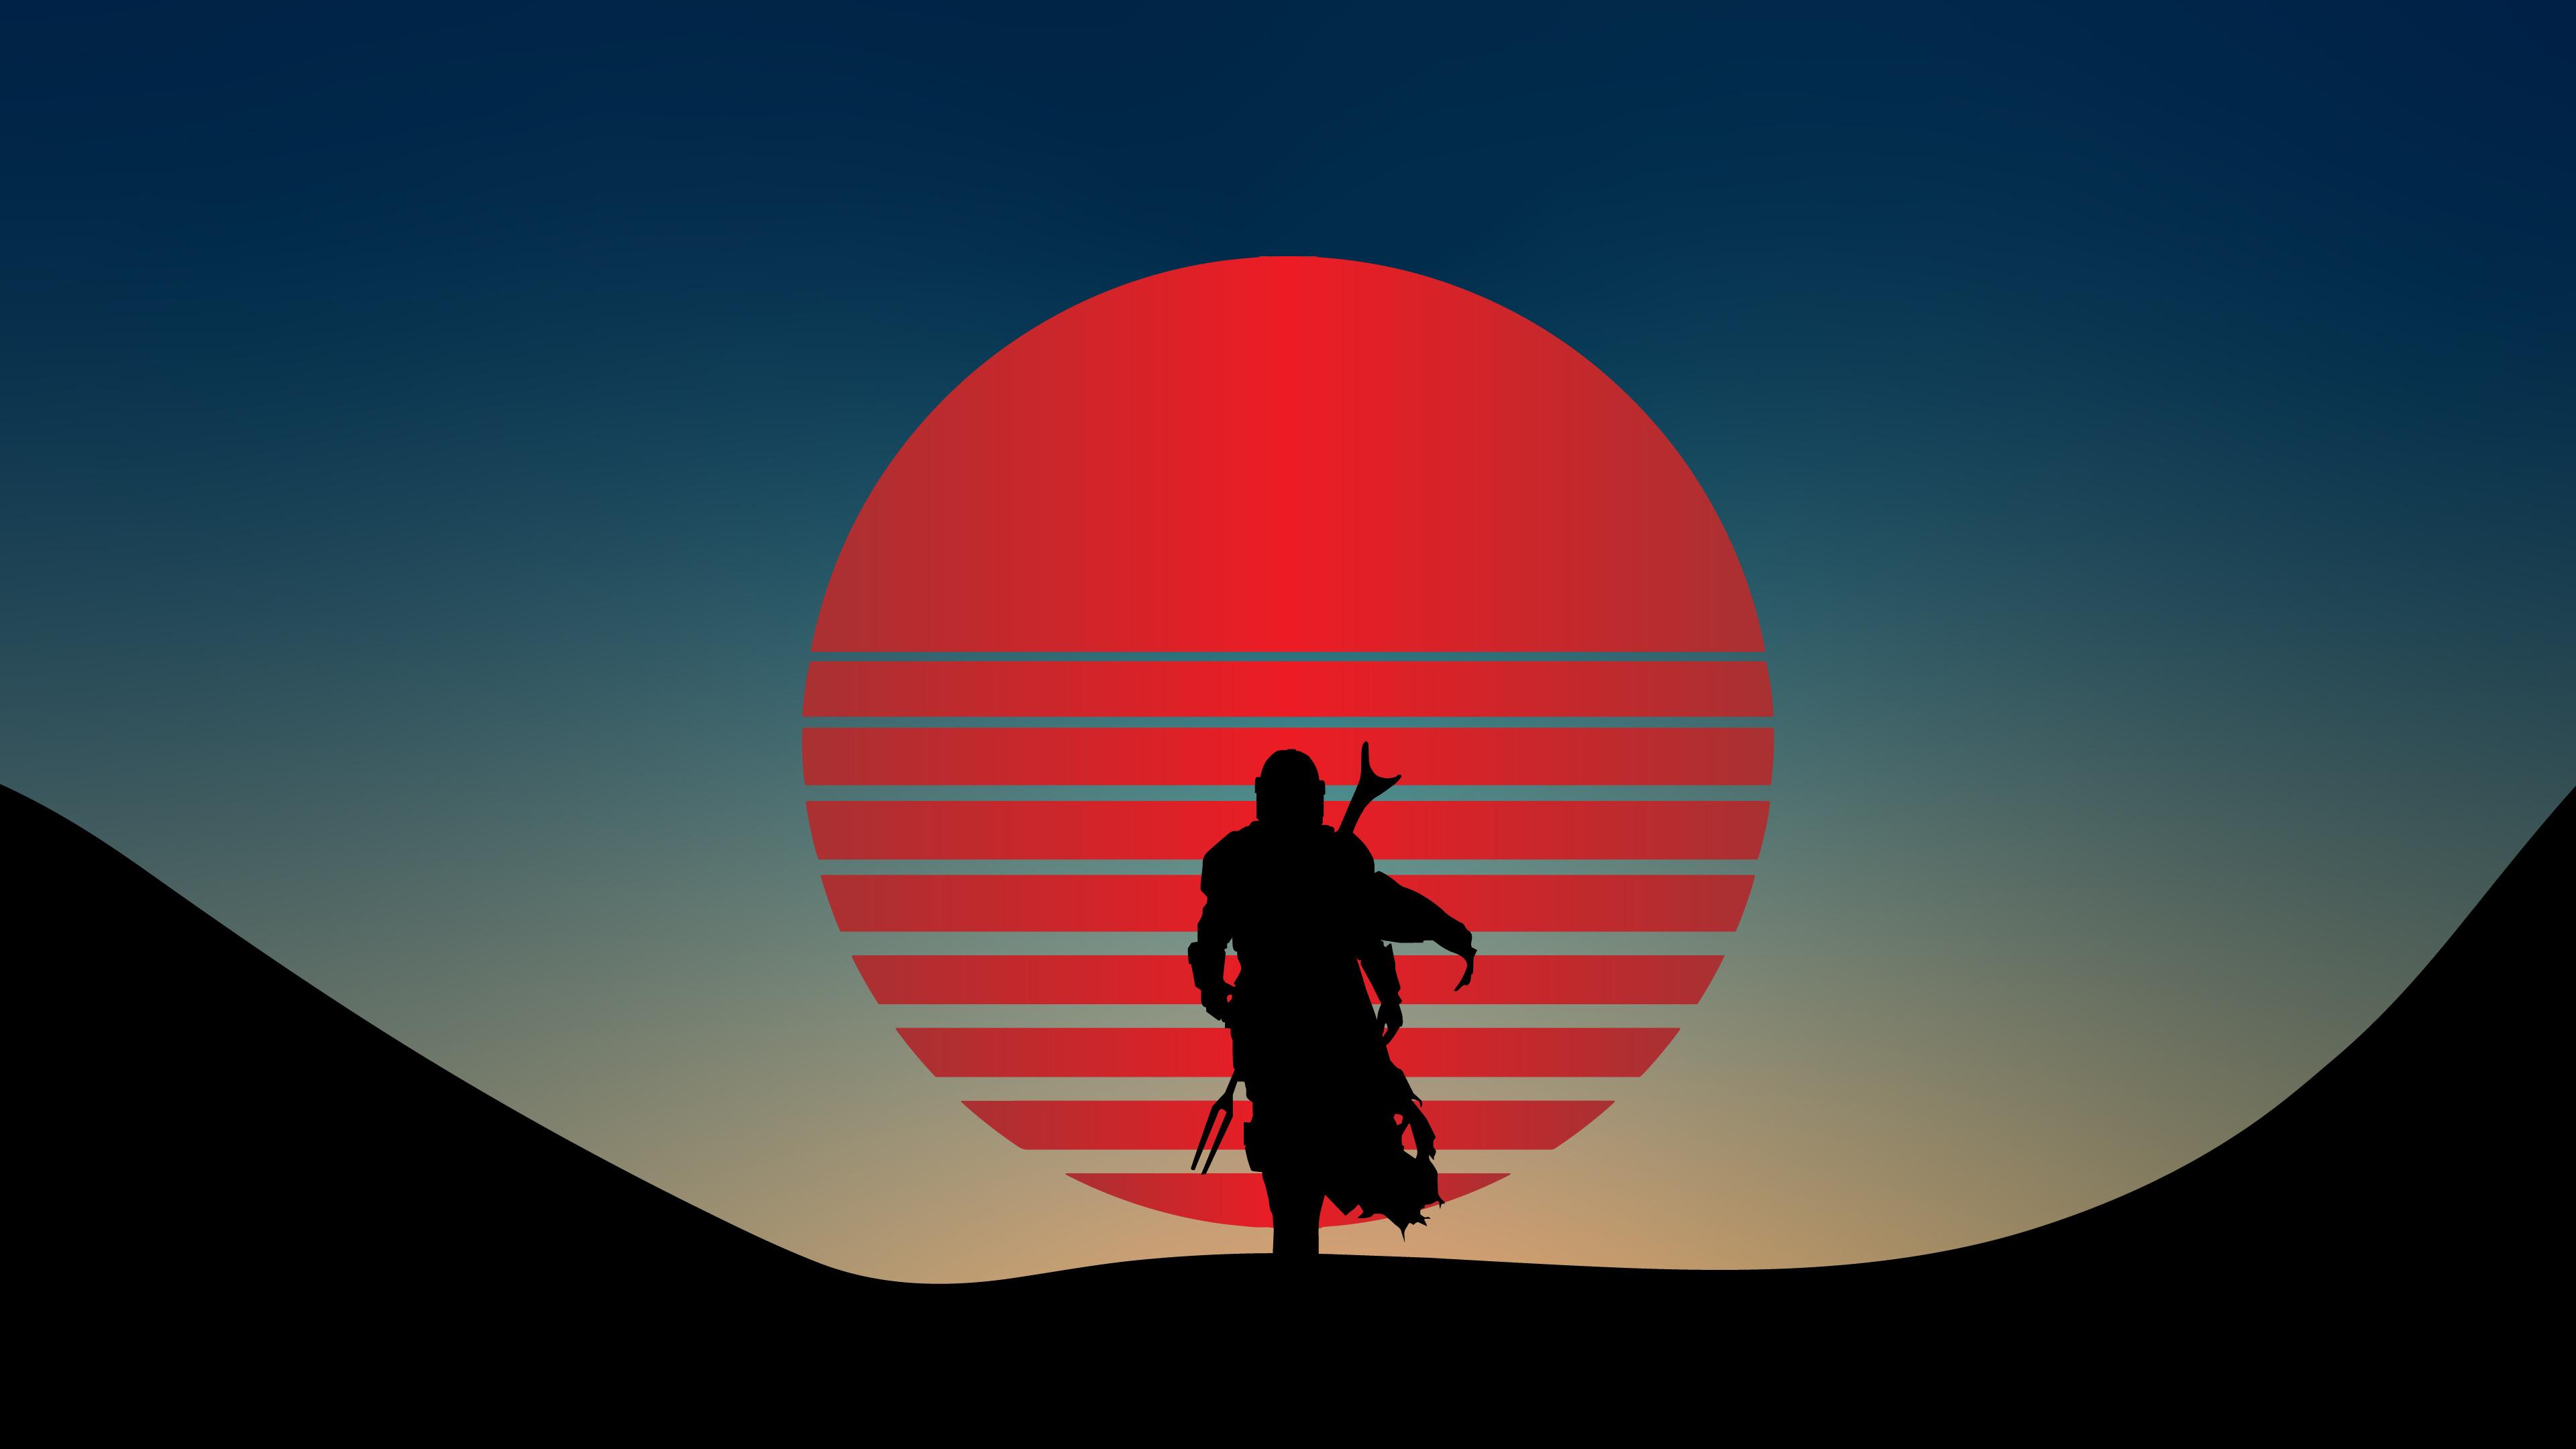 the-mandalorian-star-wars-minimal-4k-d3.jpg